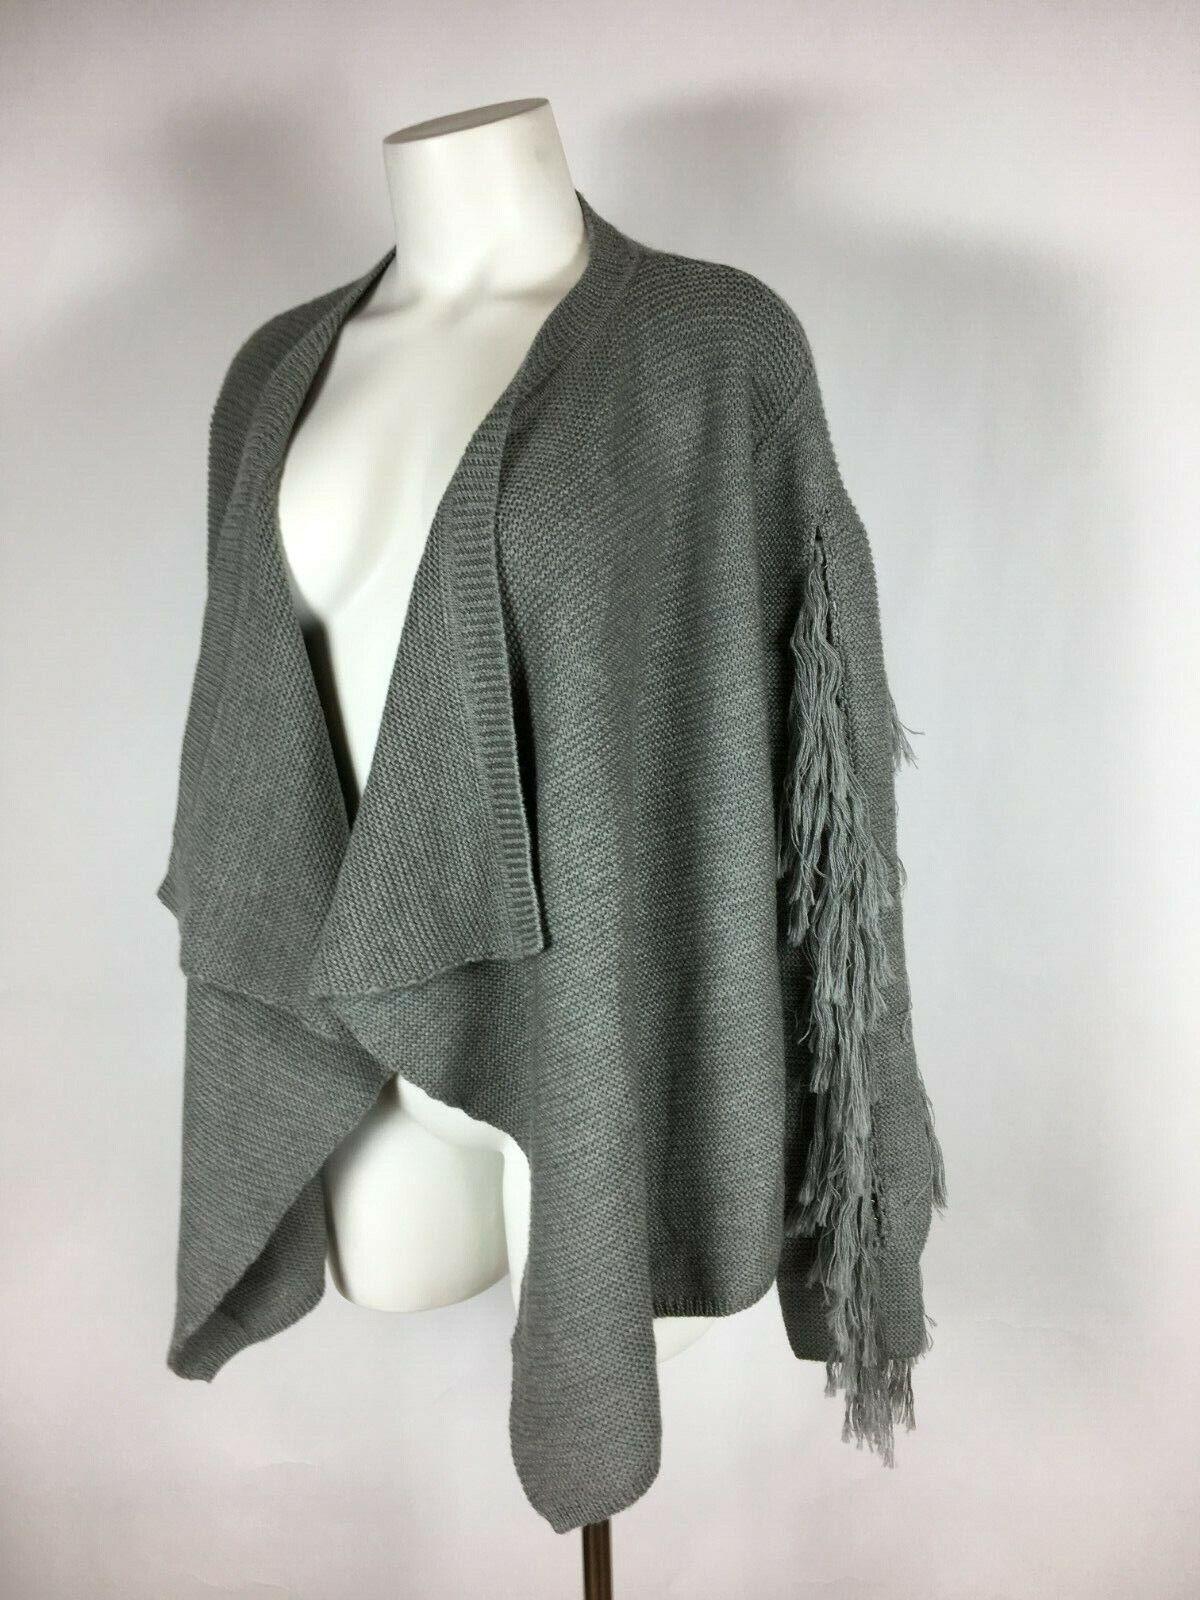 RAMY BROOK - Fringed Sleeve Draped Panel front Cardigan Sweater XS